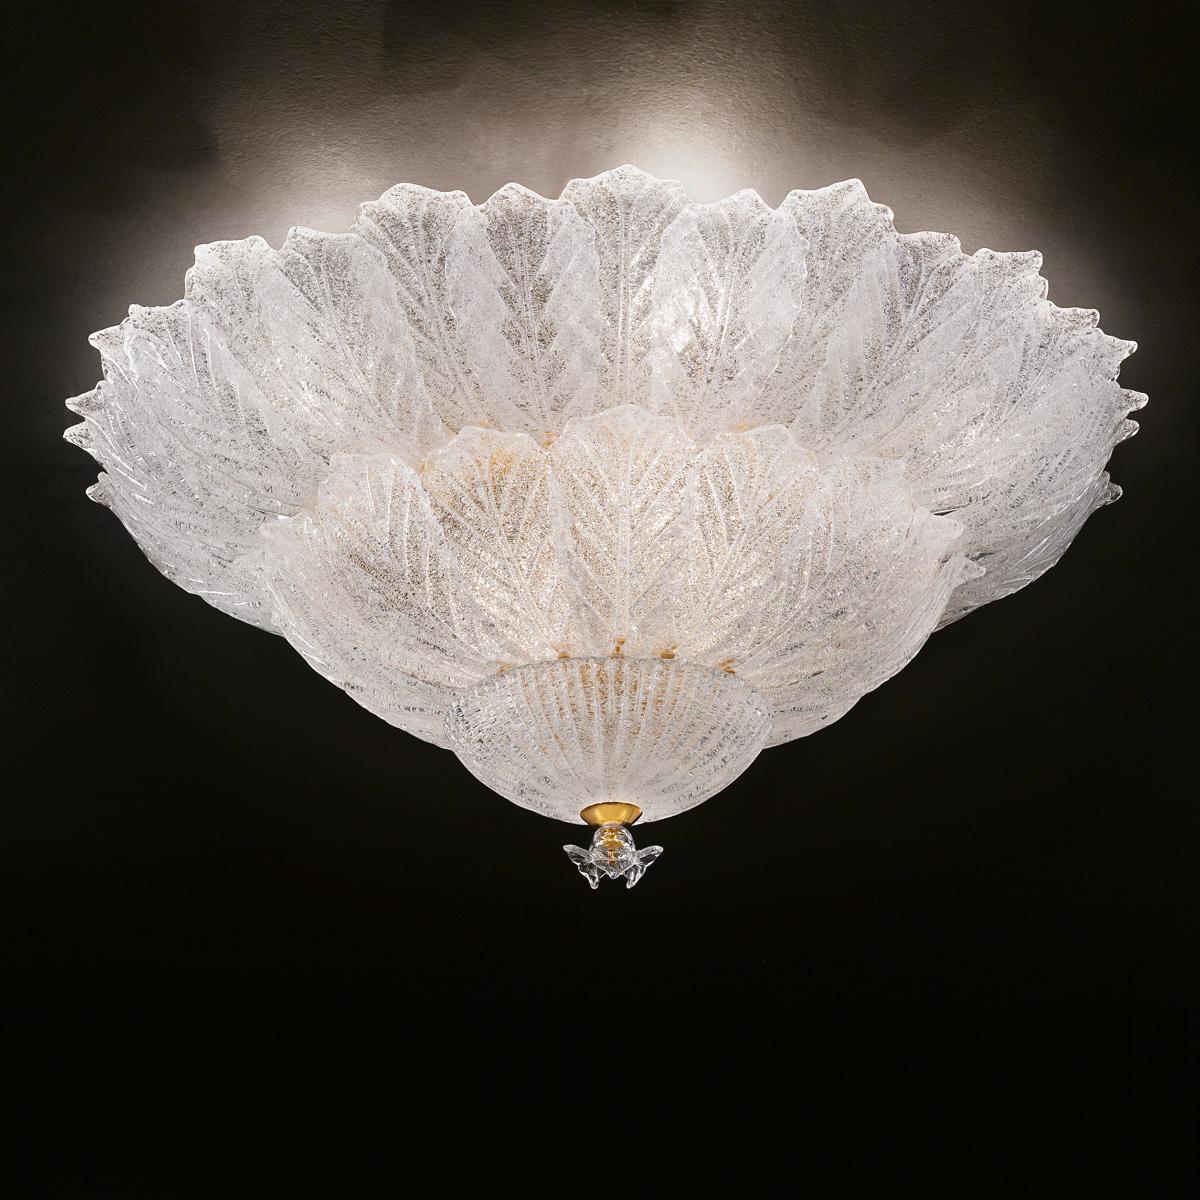 """Osanna"" lampara de techo de Murano - 12 luce - ""rugiada"" transparente"